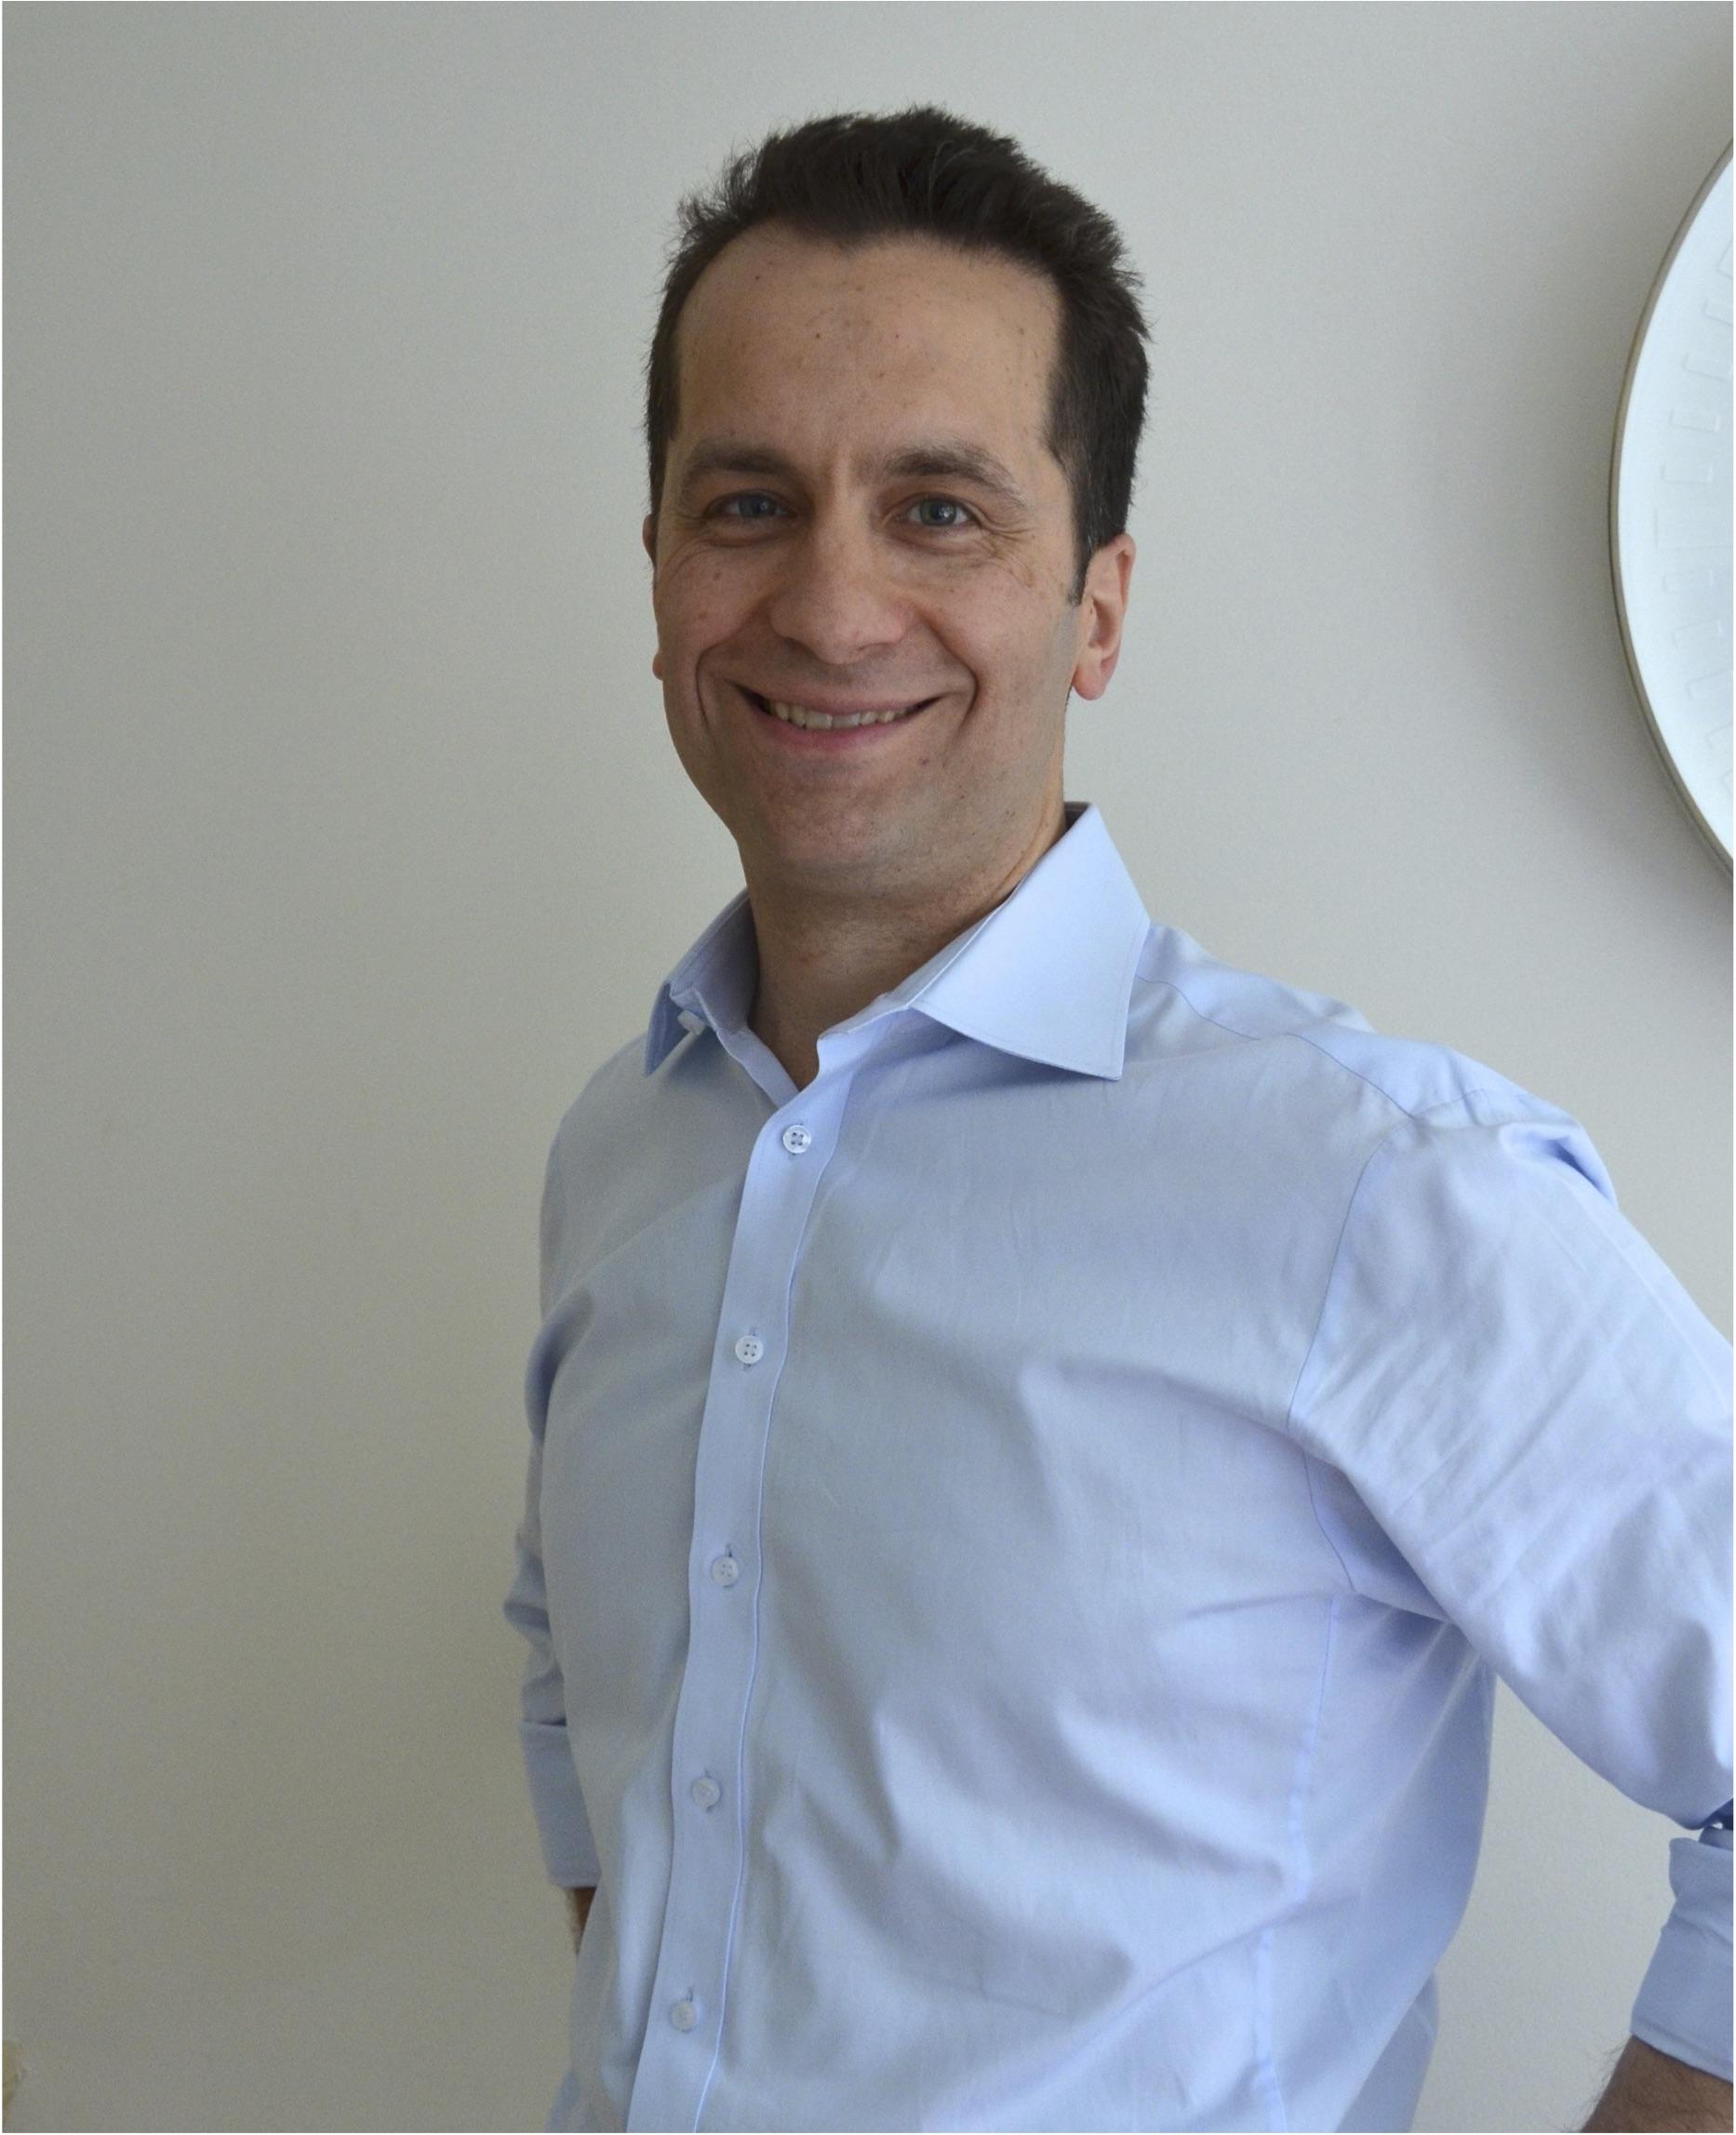 LEON KOUTSOVASILIS - TECHNOLOGY LEADER, DIGITAL INNOVATOR FOR LEADING GLOBAL FIRMS ACROSS BROAD SECTOR-RANGE. global cto, cio